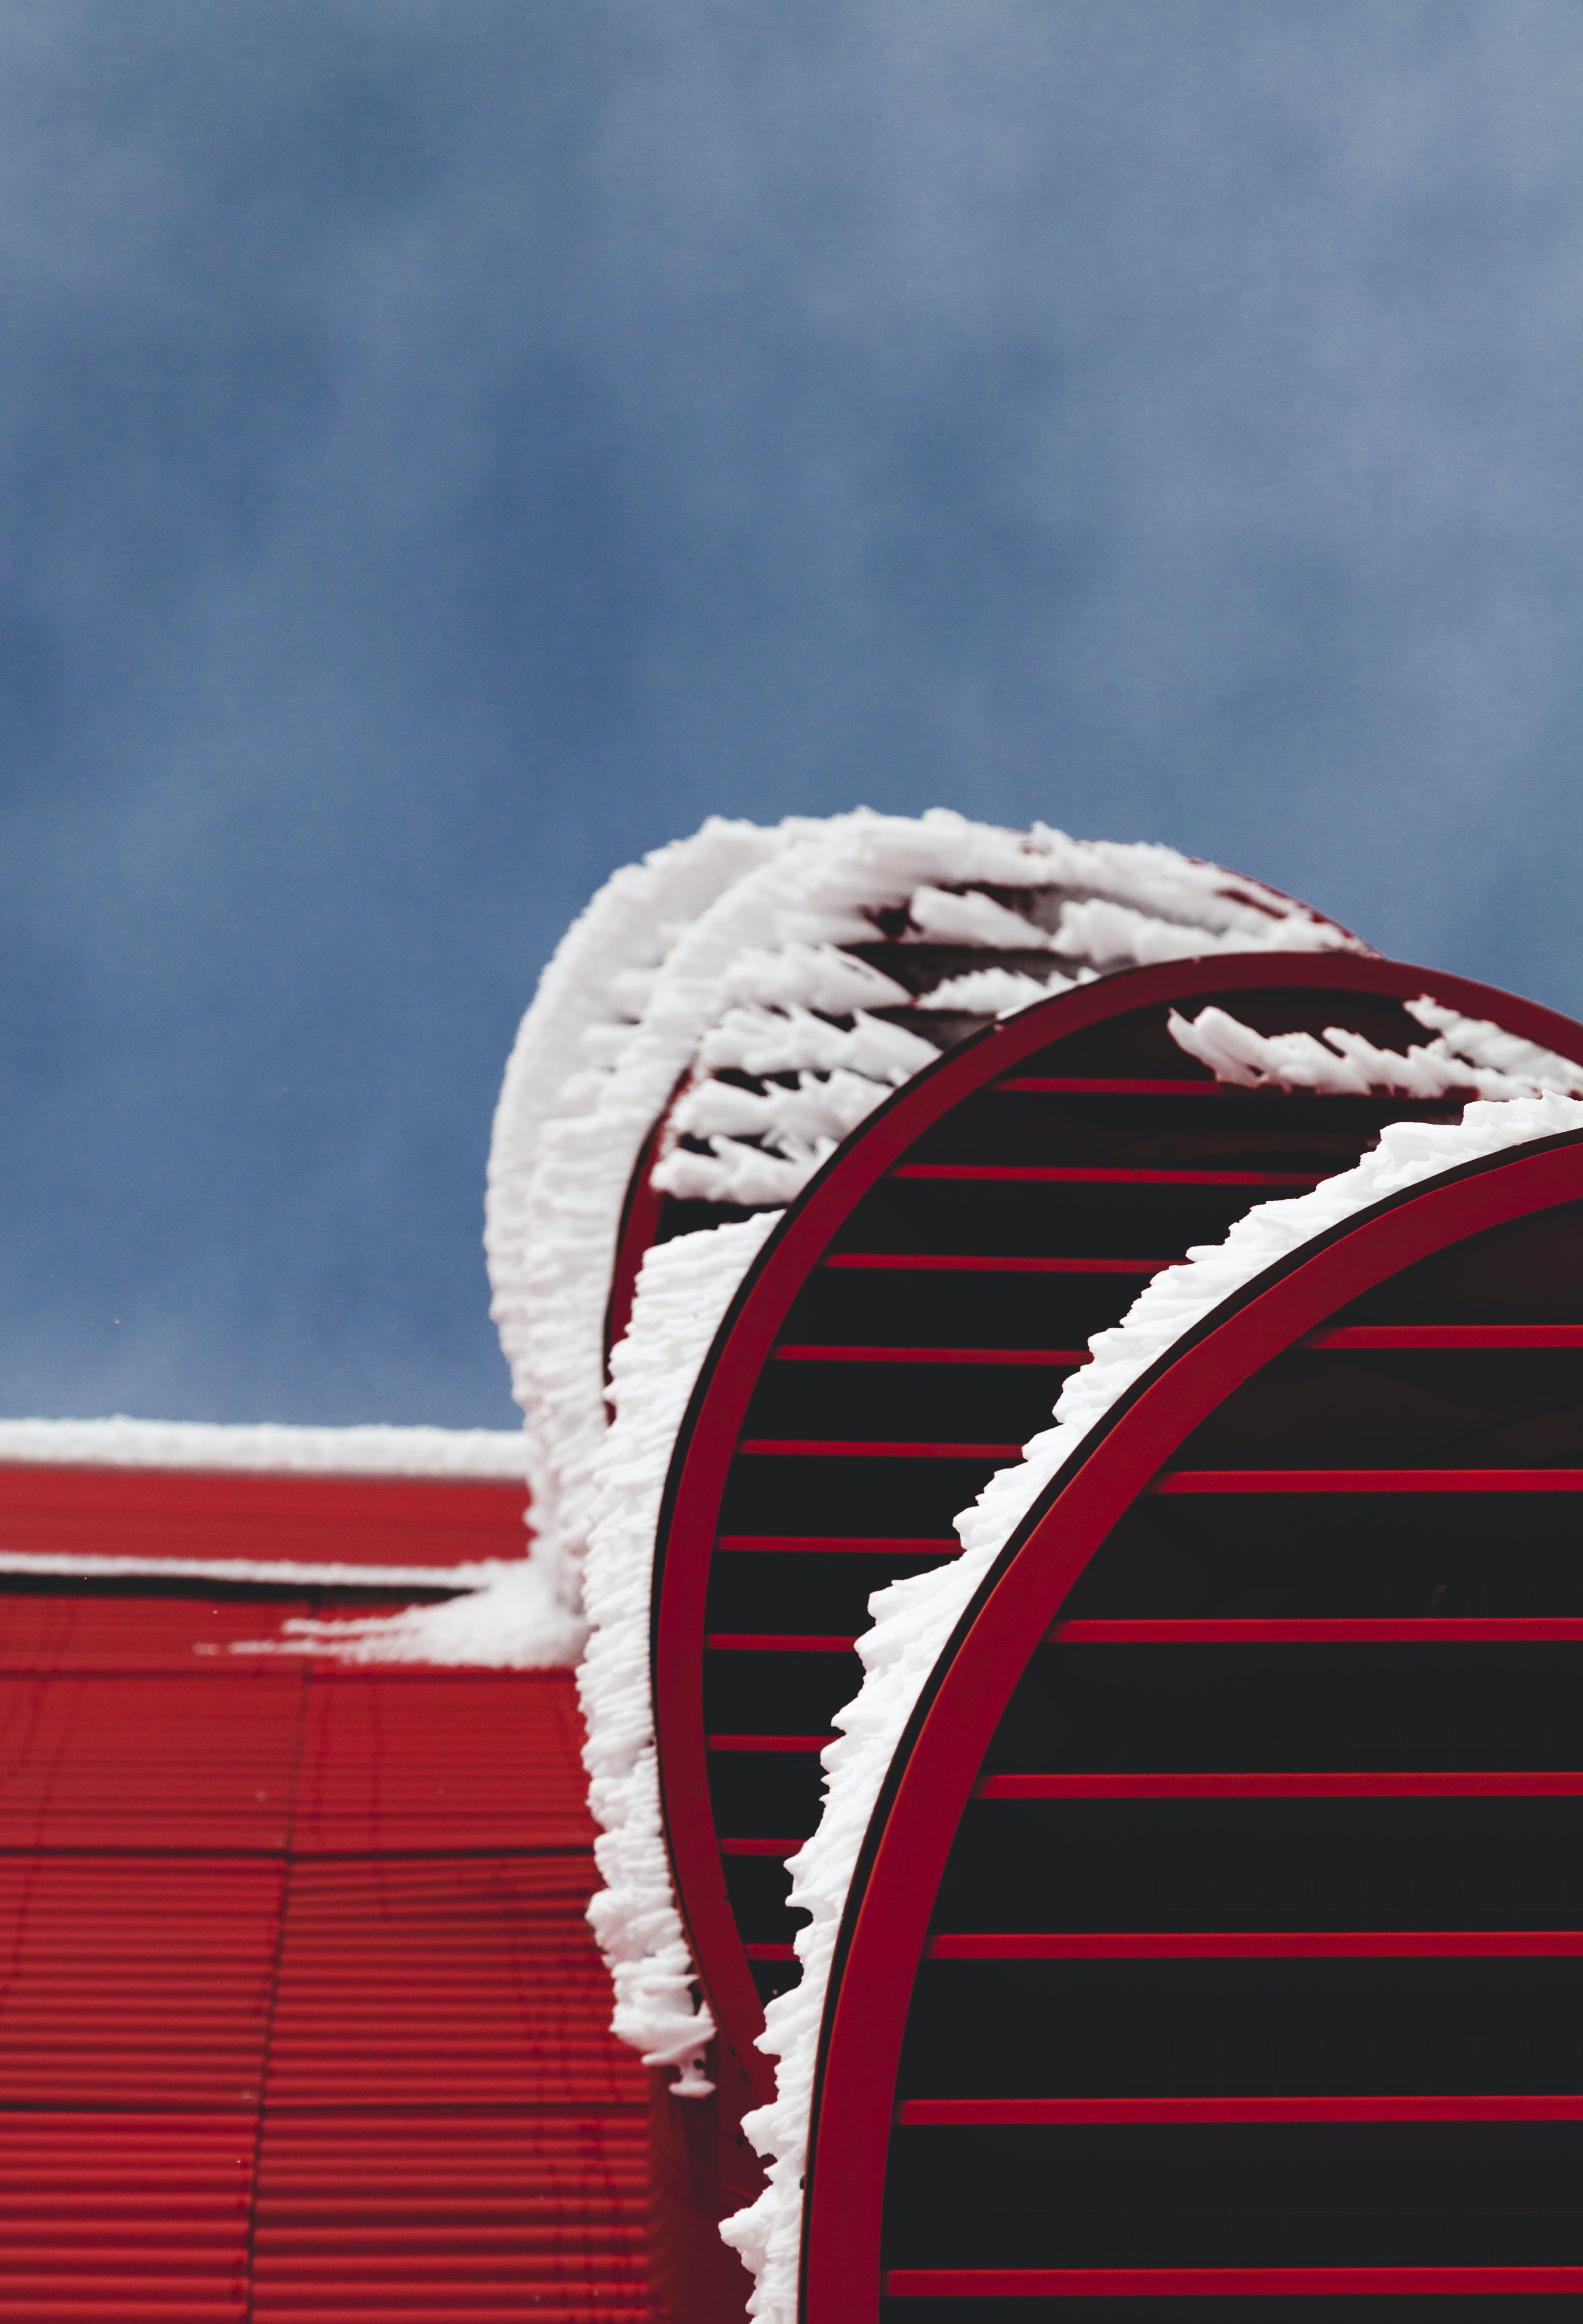 Gratis stockfoto met architectuur, bevroren, daglicht, hemel